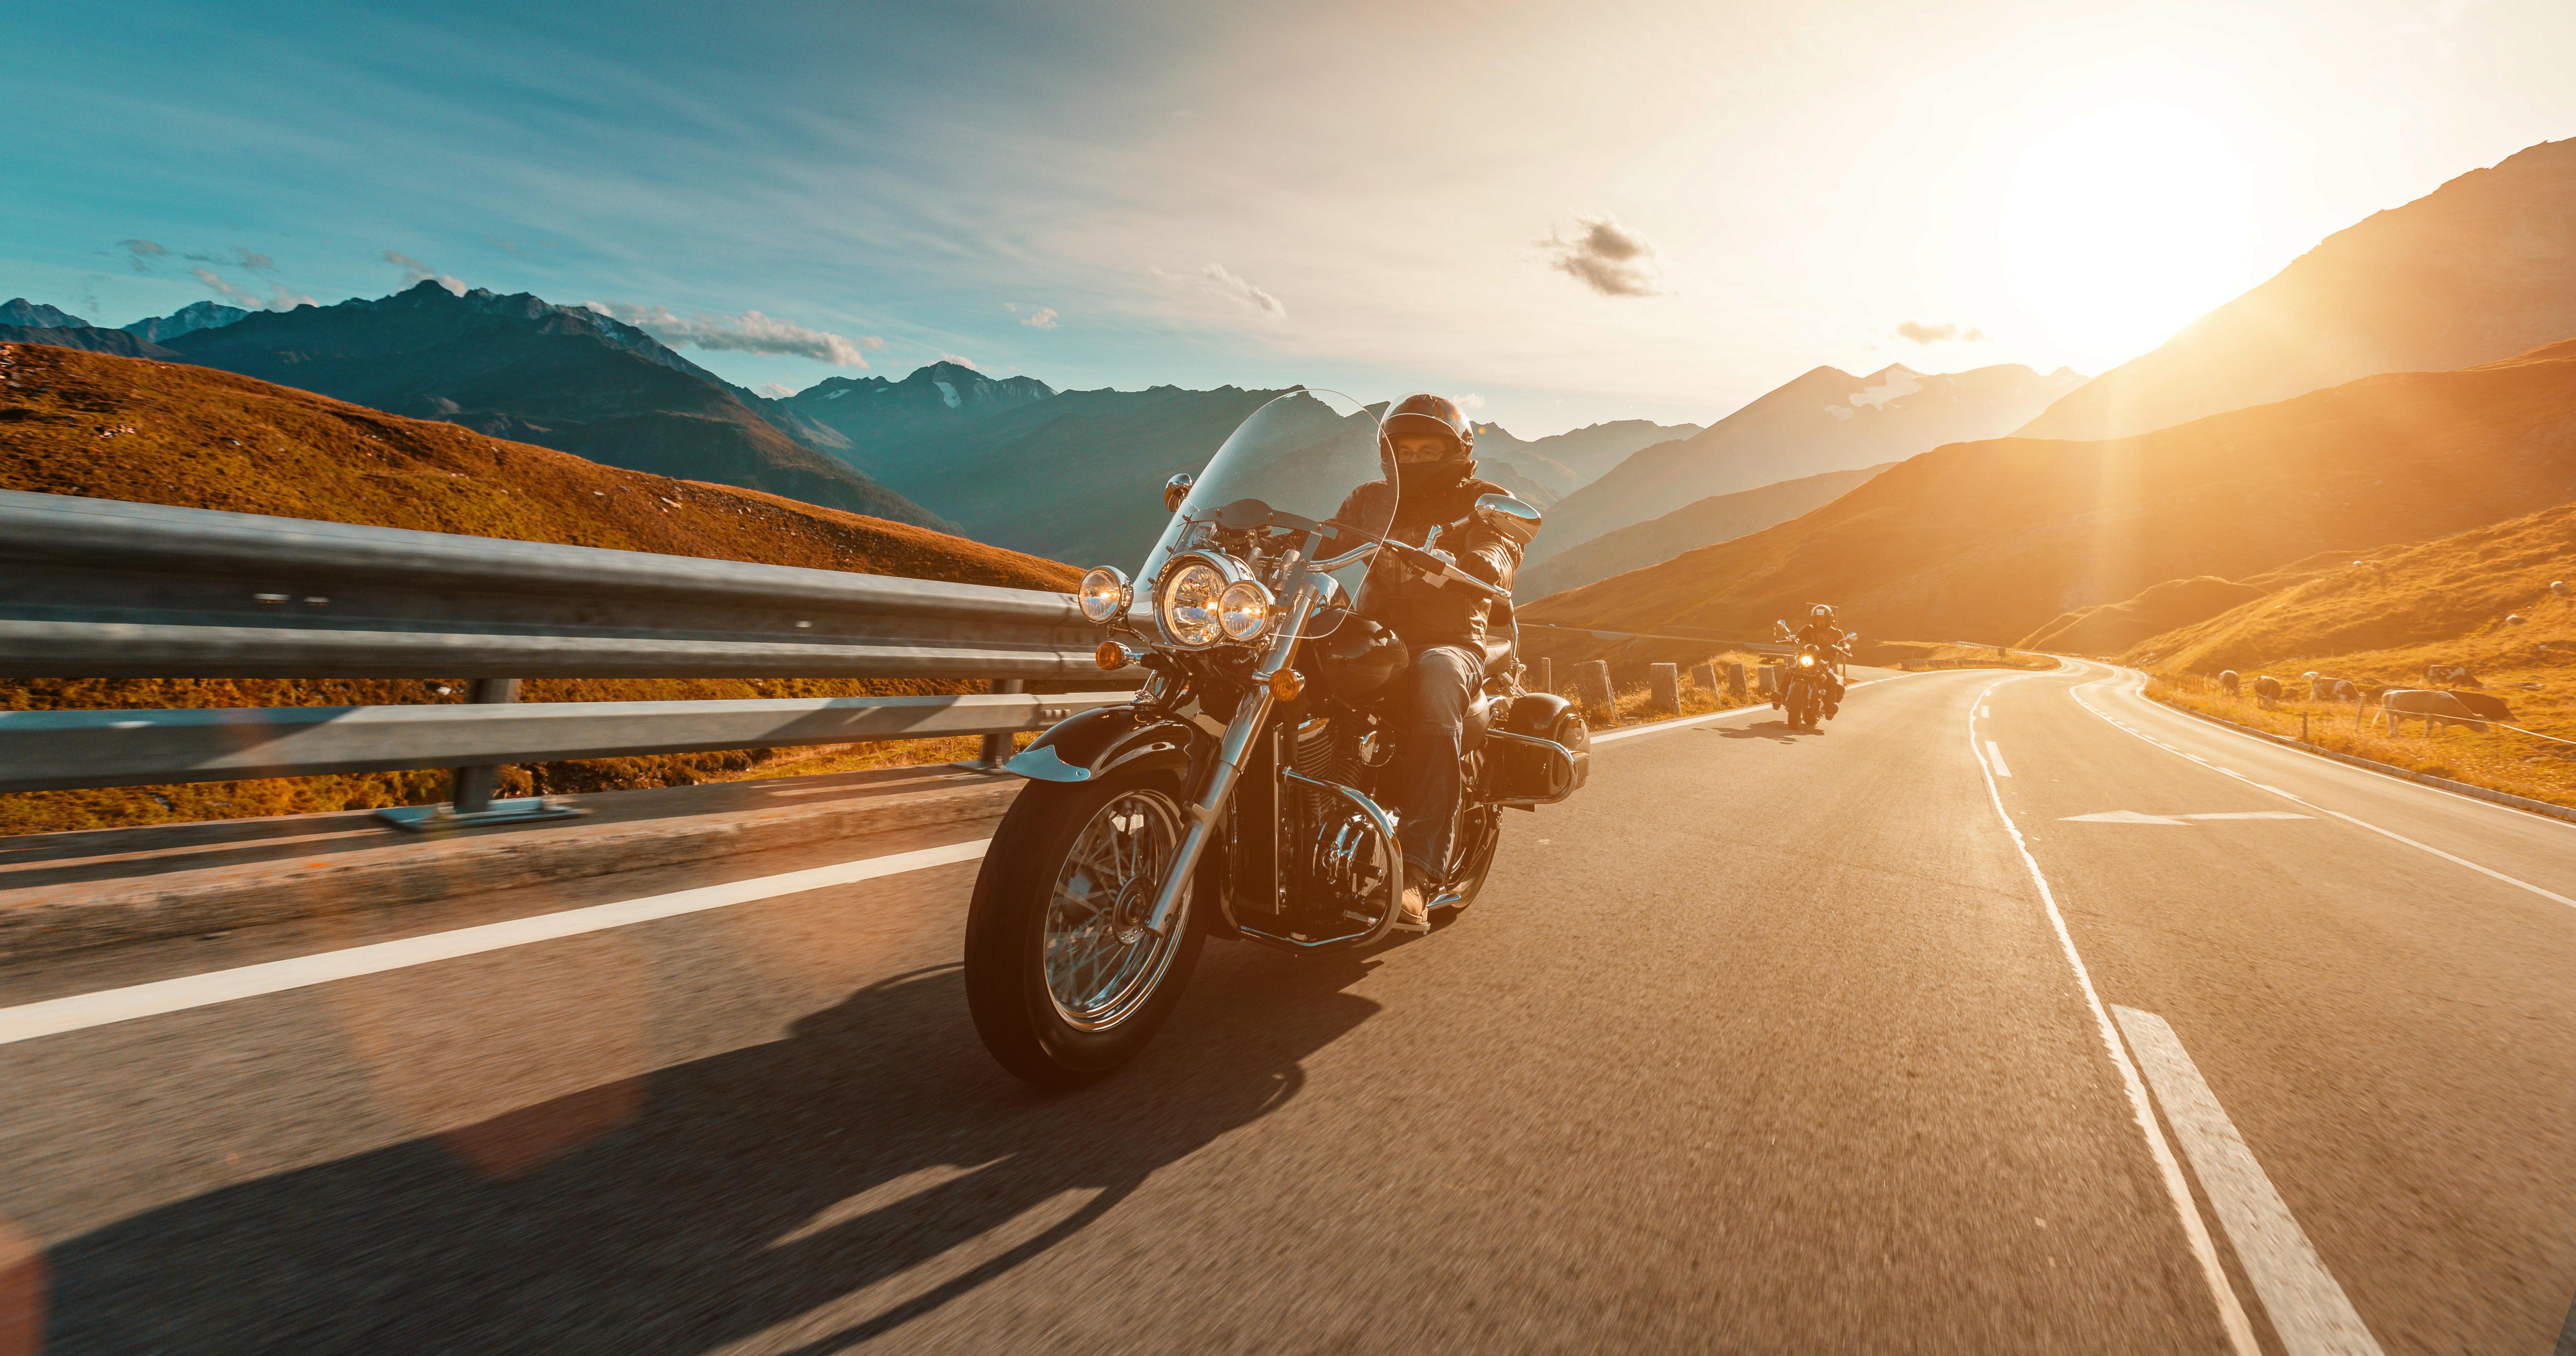 Alps_route_mountains_Austria_biker_52b